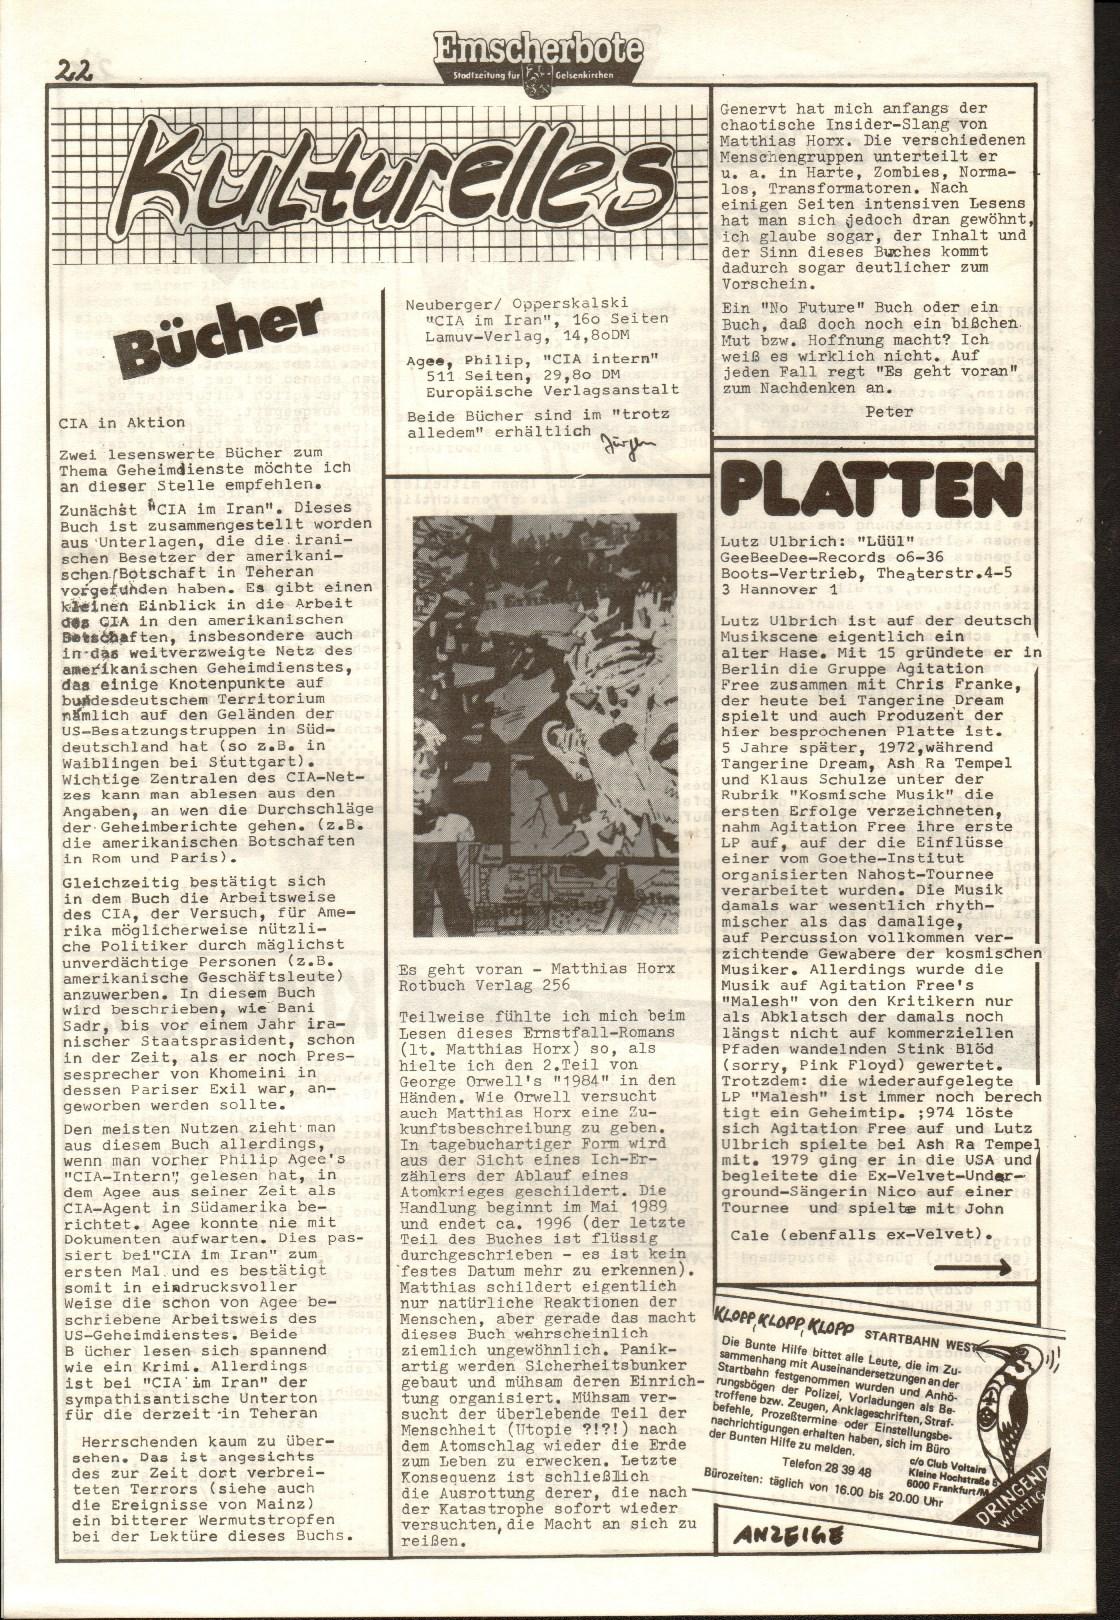 Gelsenkirchen_Emscherbote_1982_18_22